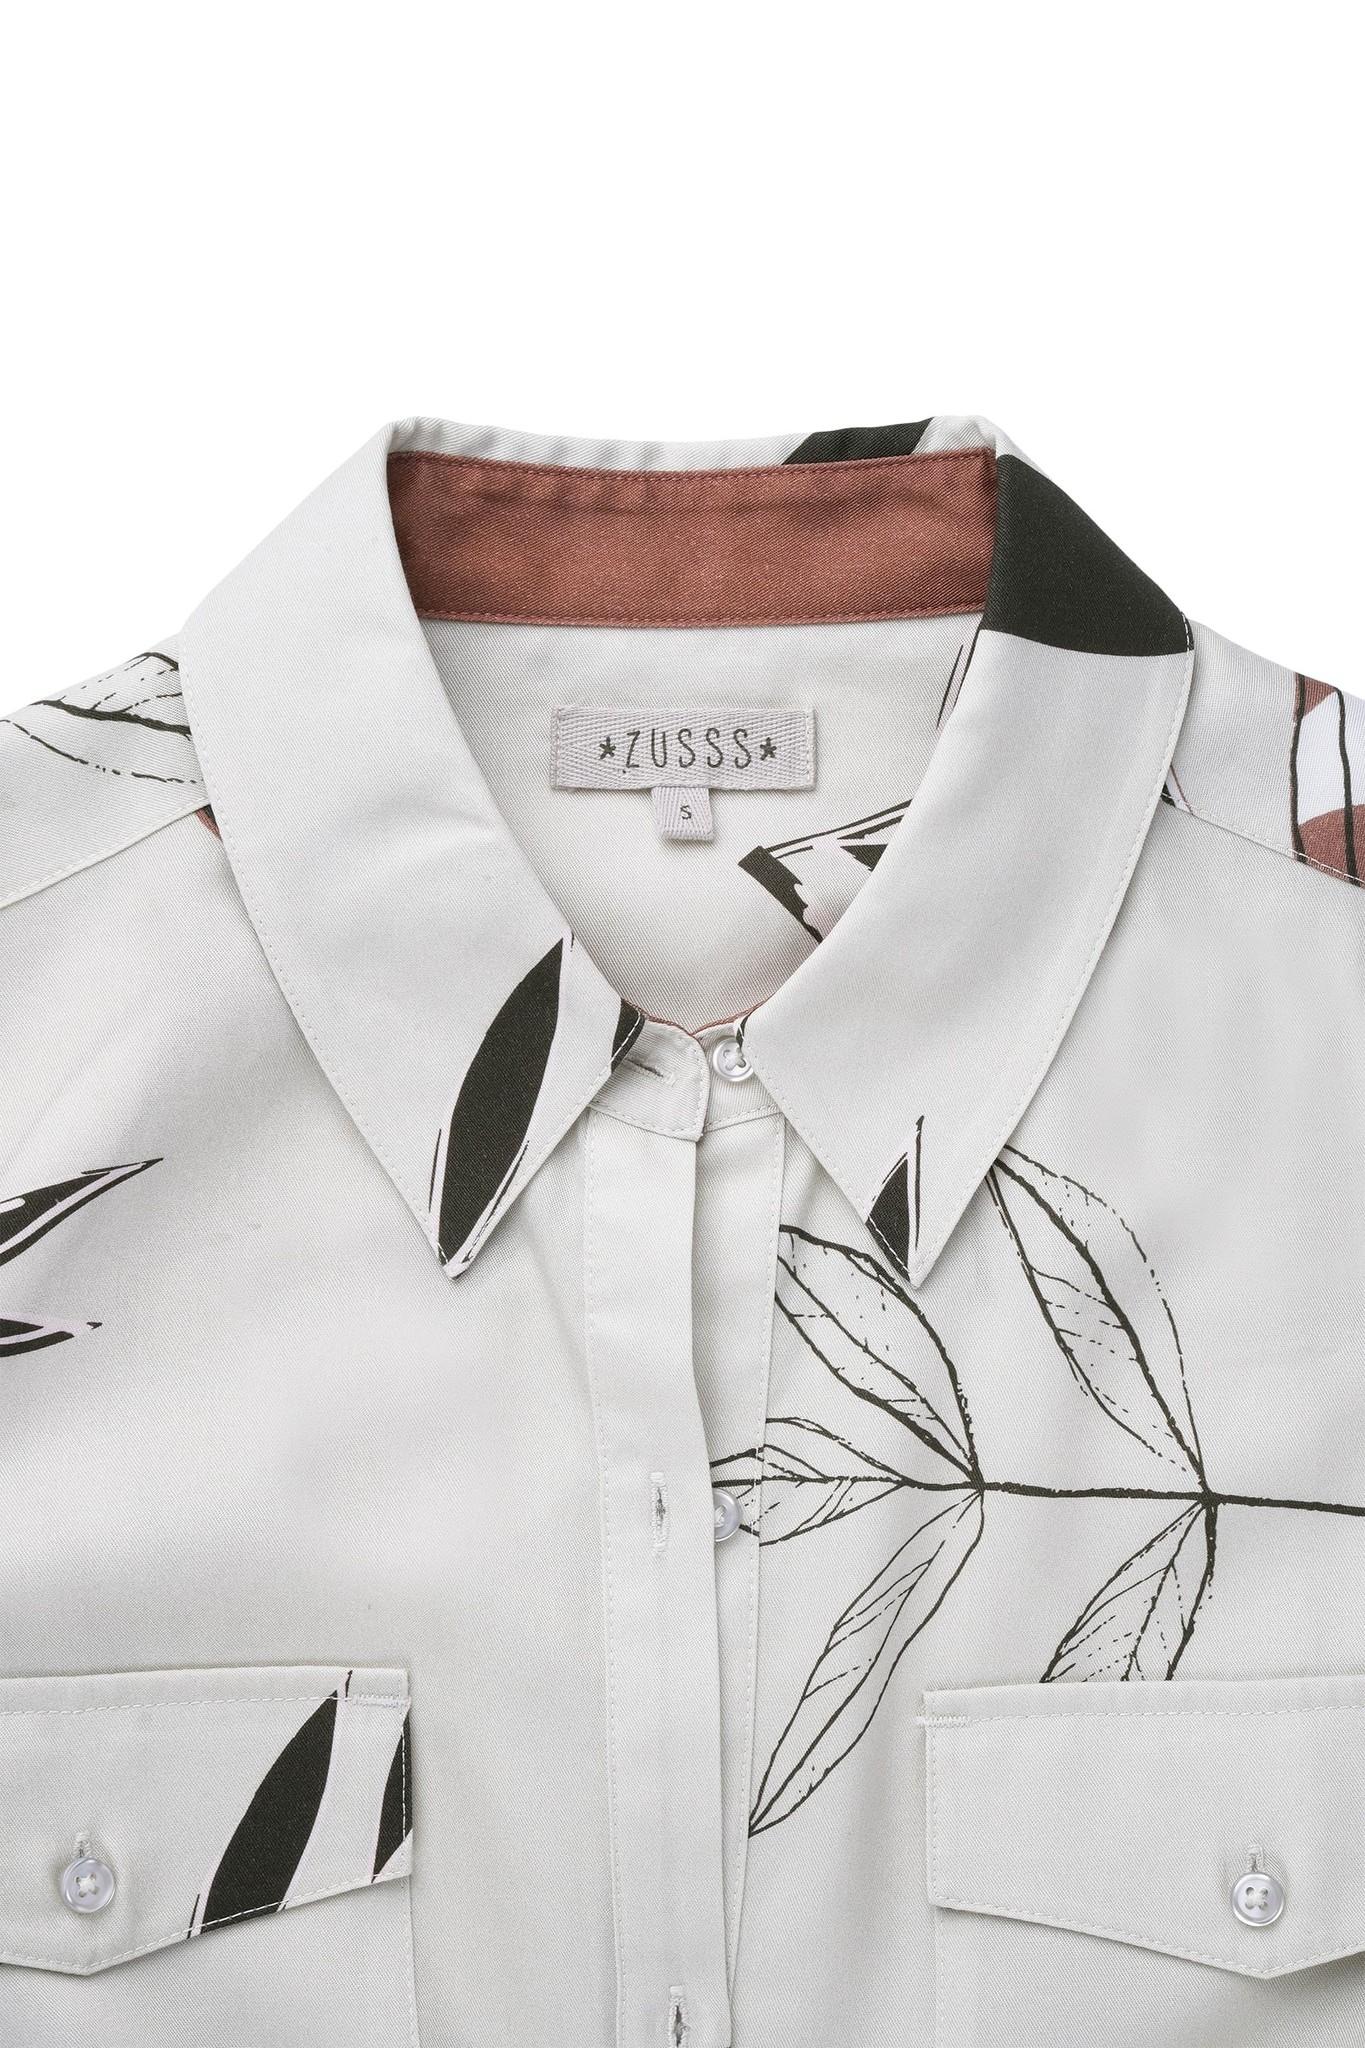 Zusss blousejurk met ceintuur bladprint